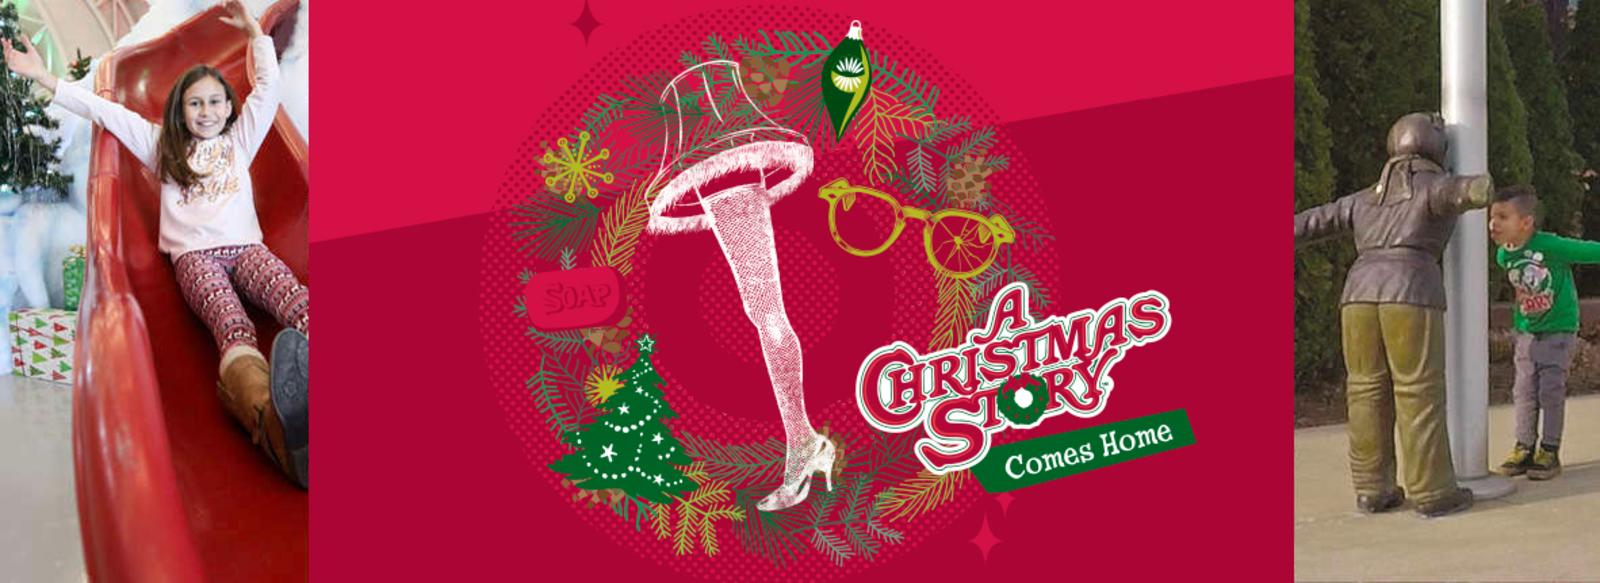 A Christmas Story Comes Home